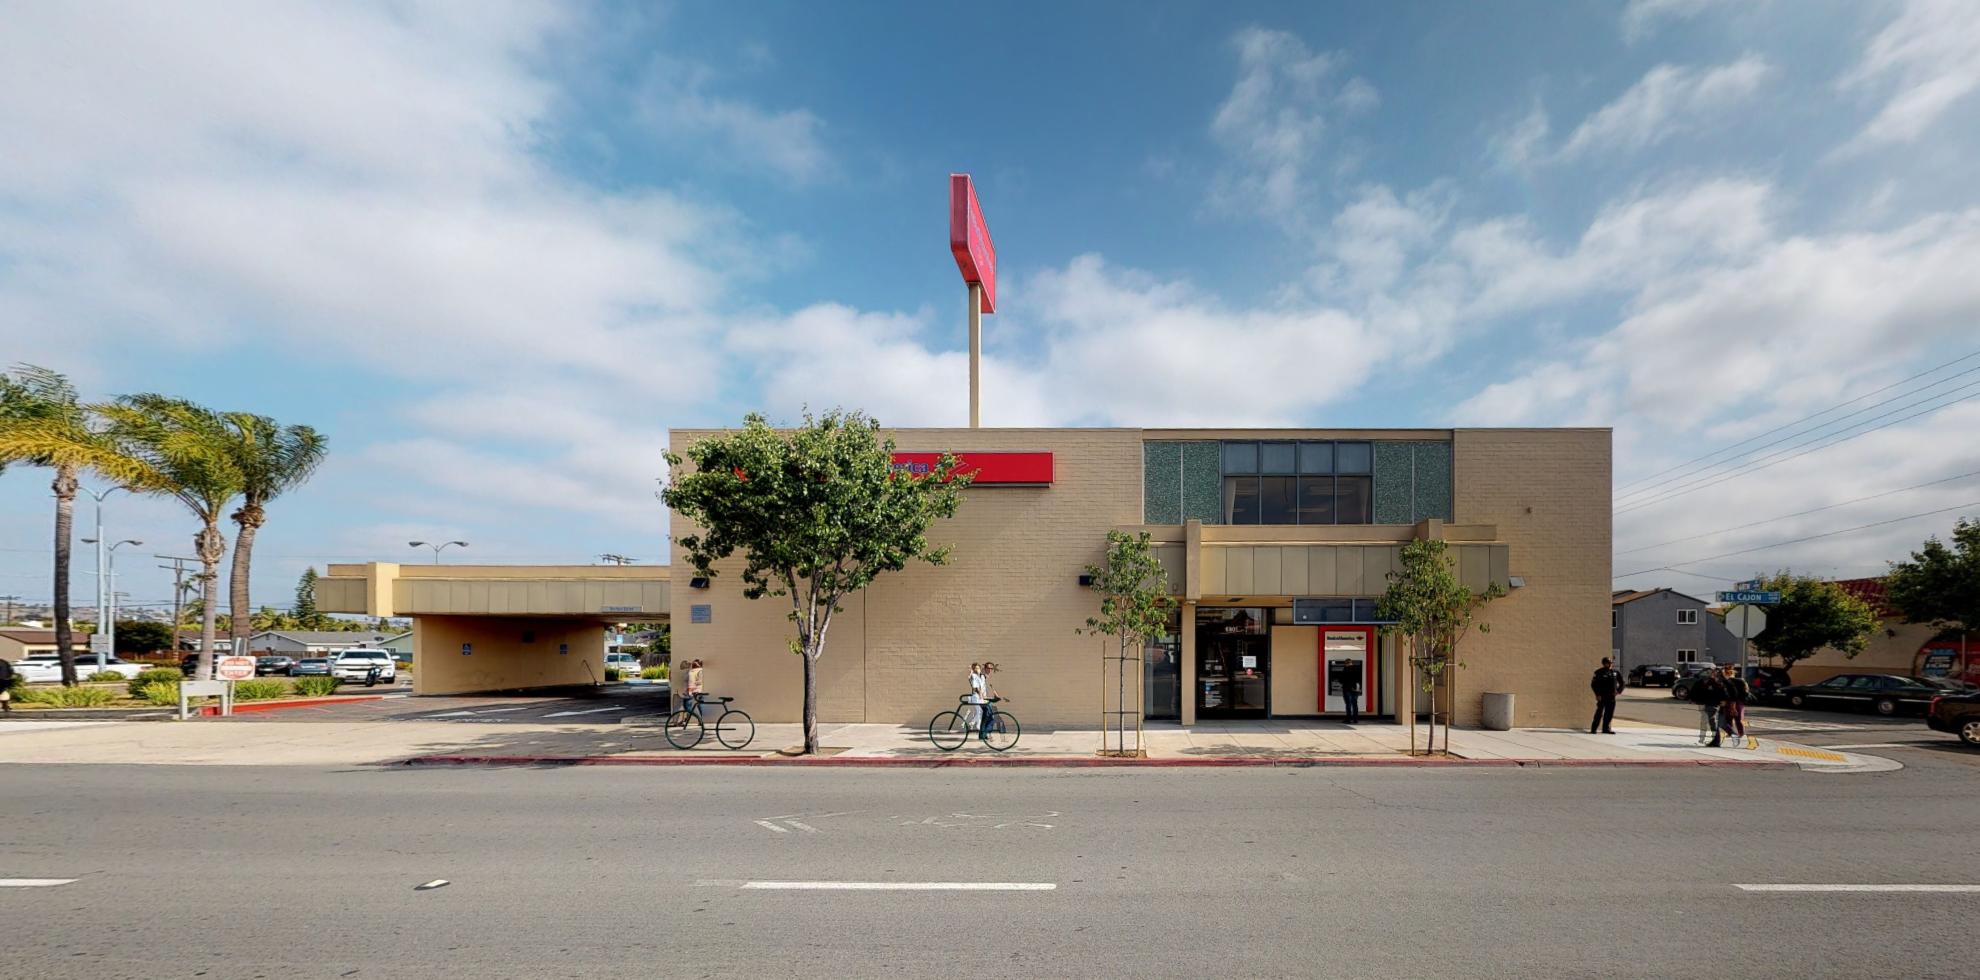 Bank of America financial center with drive-thru ATM | 6801 El Cajon Blvd, San Diego, CA 92115